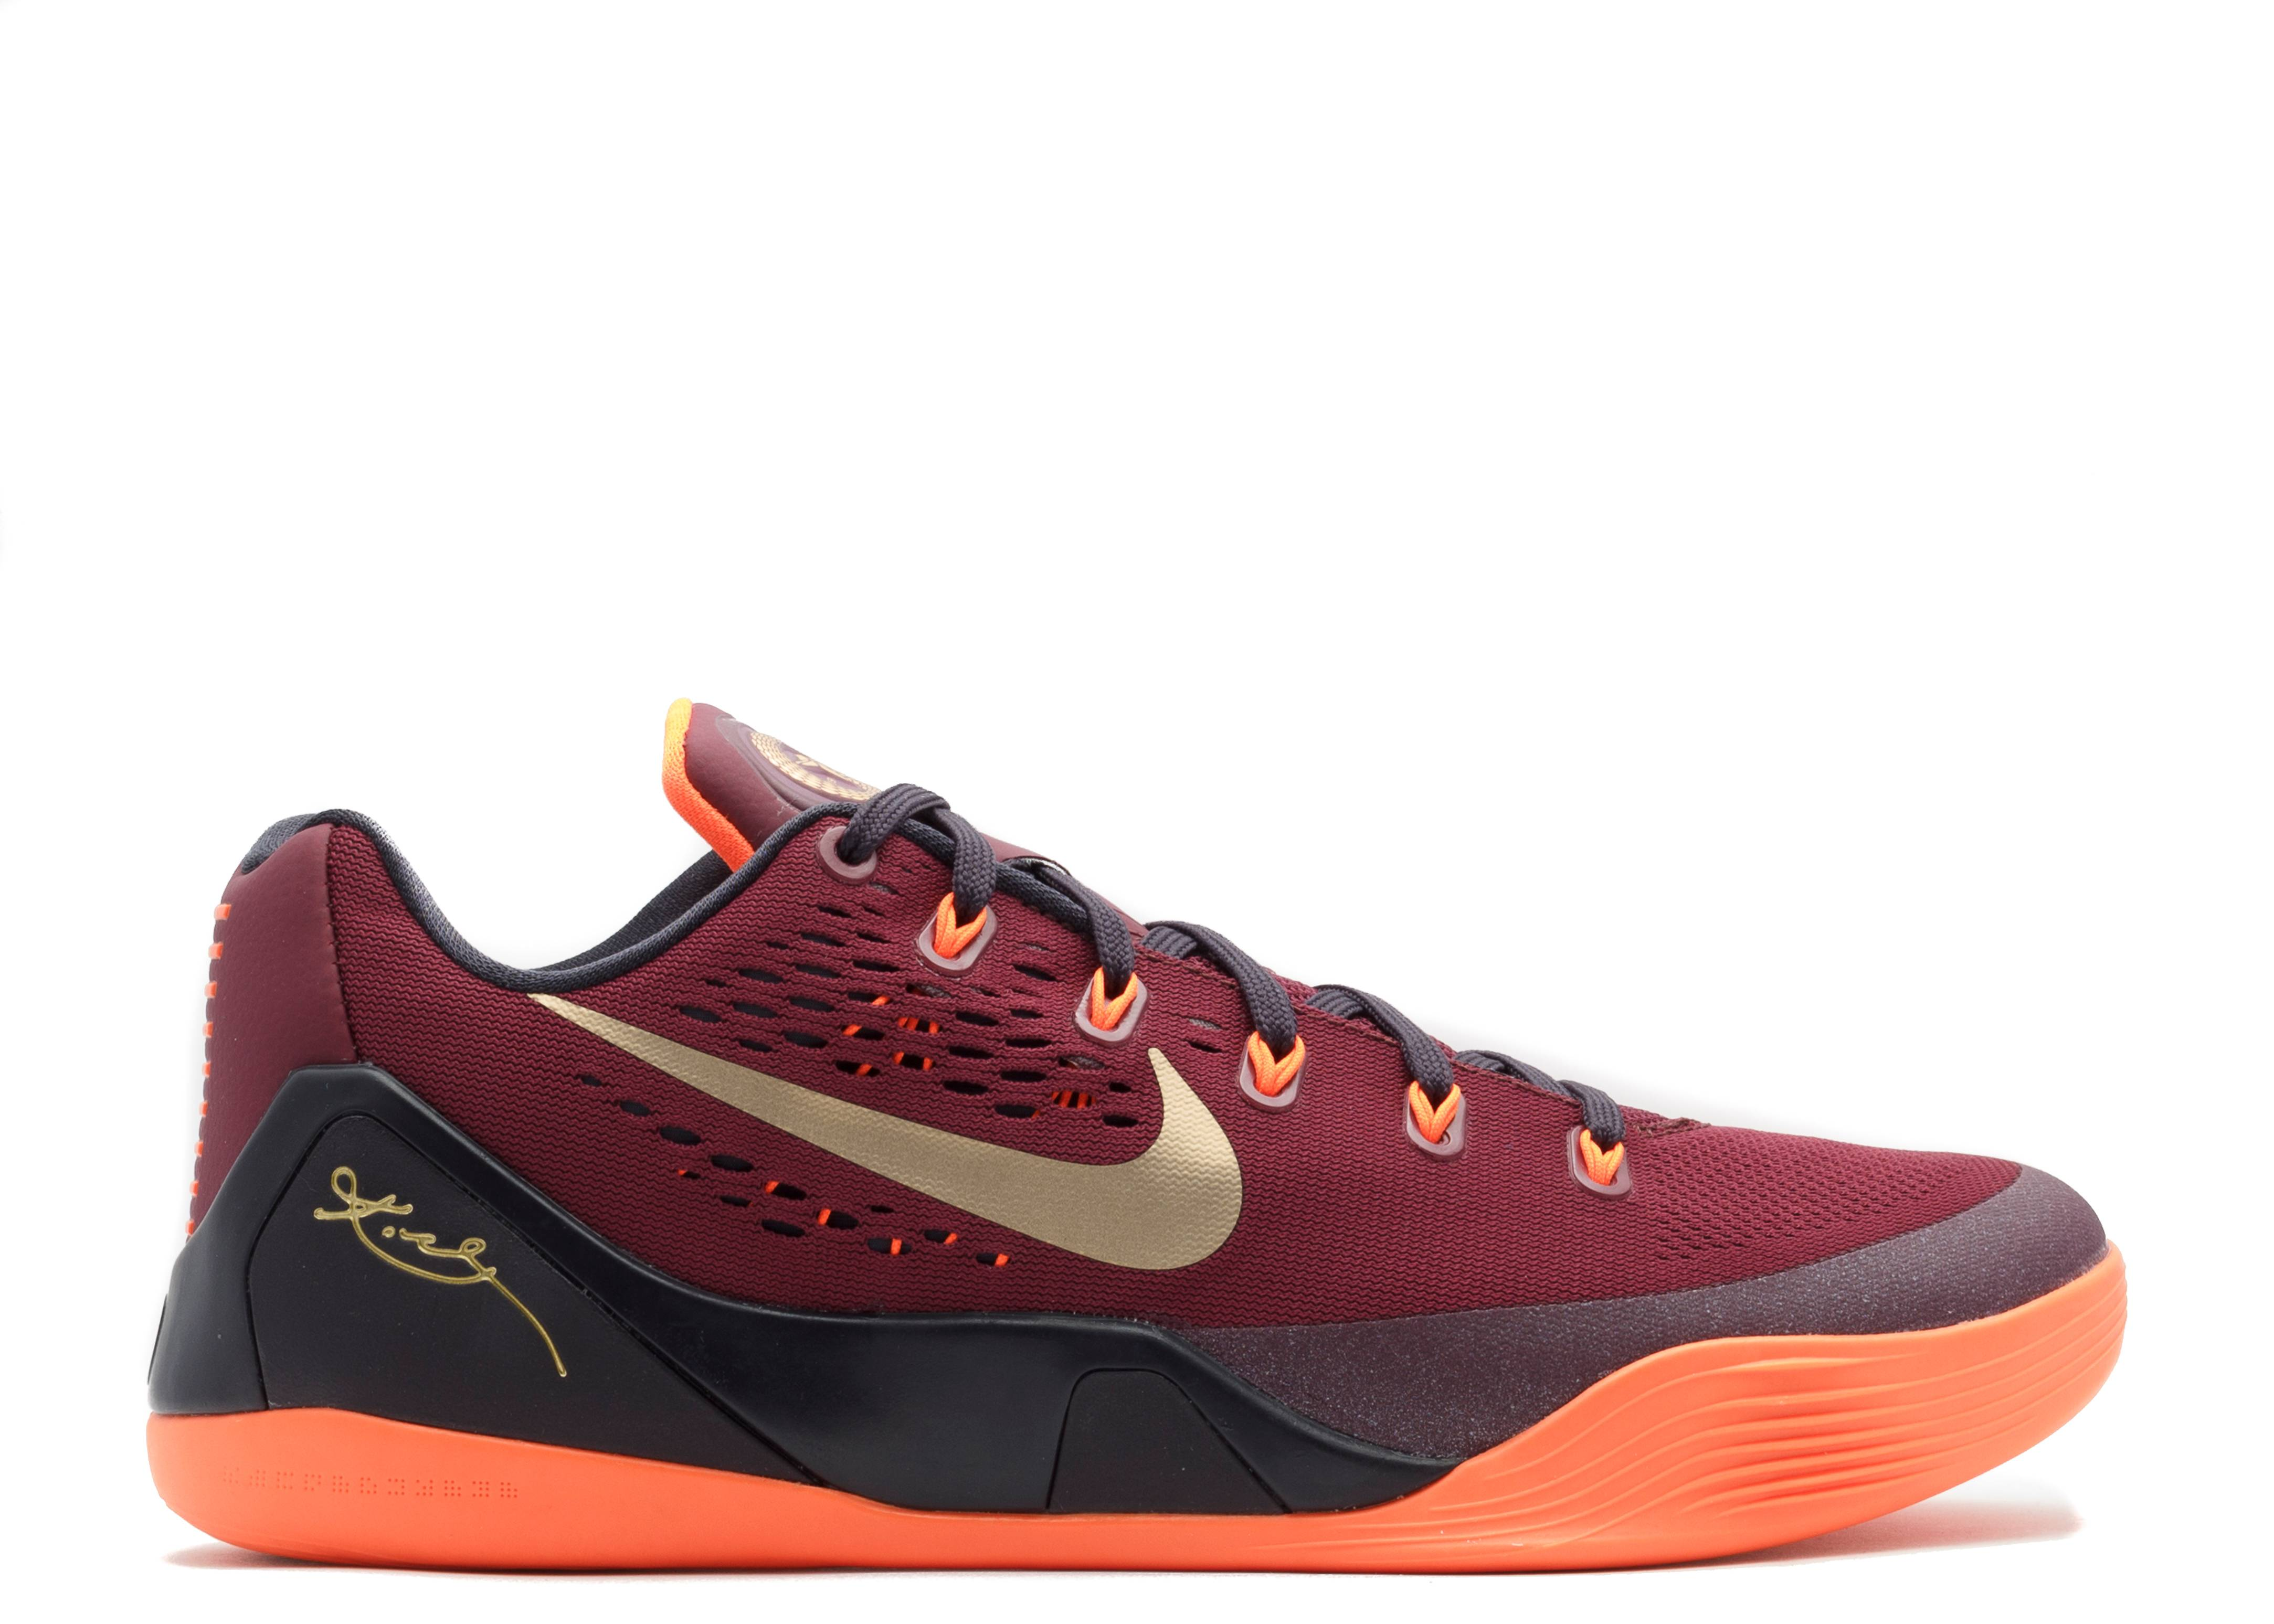 7874f3043267 Kobe Ix - Nike - 646701 678 - dp grnt mtllc gld-hypr crmsn-c ...